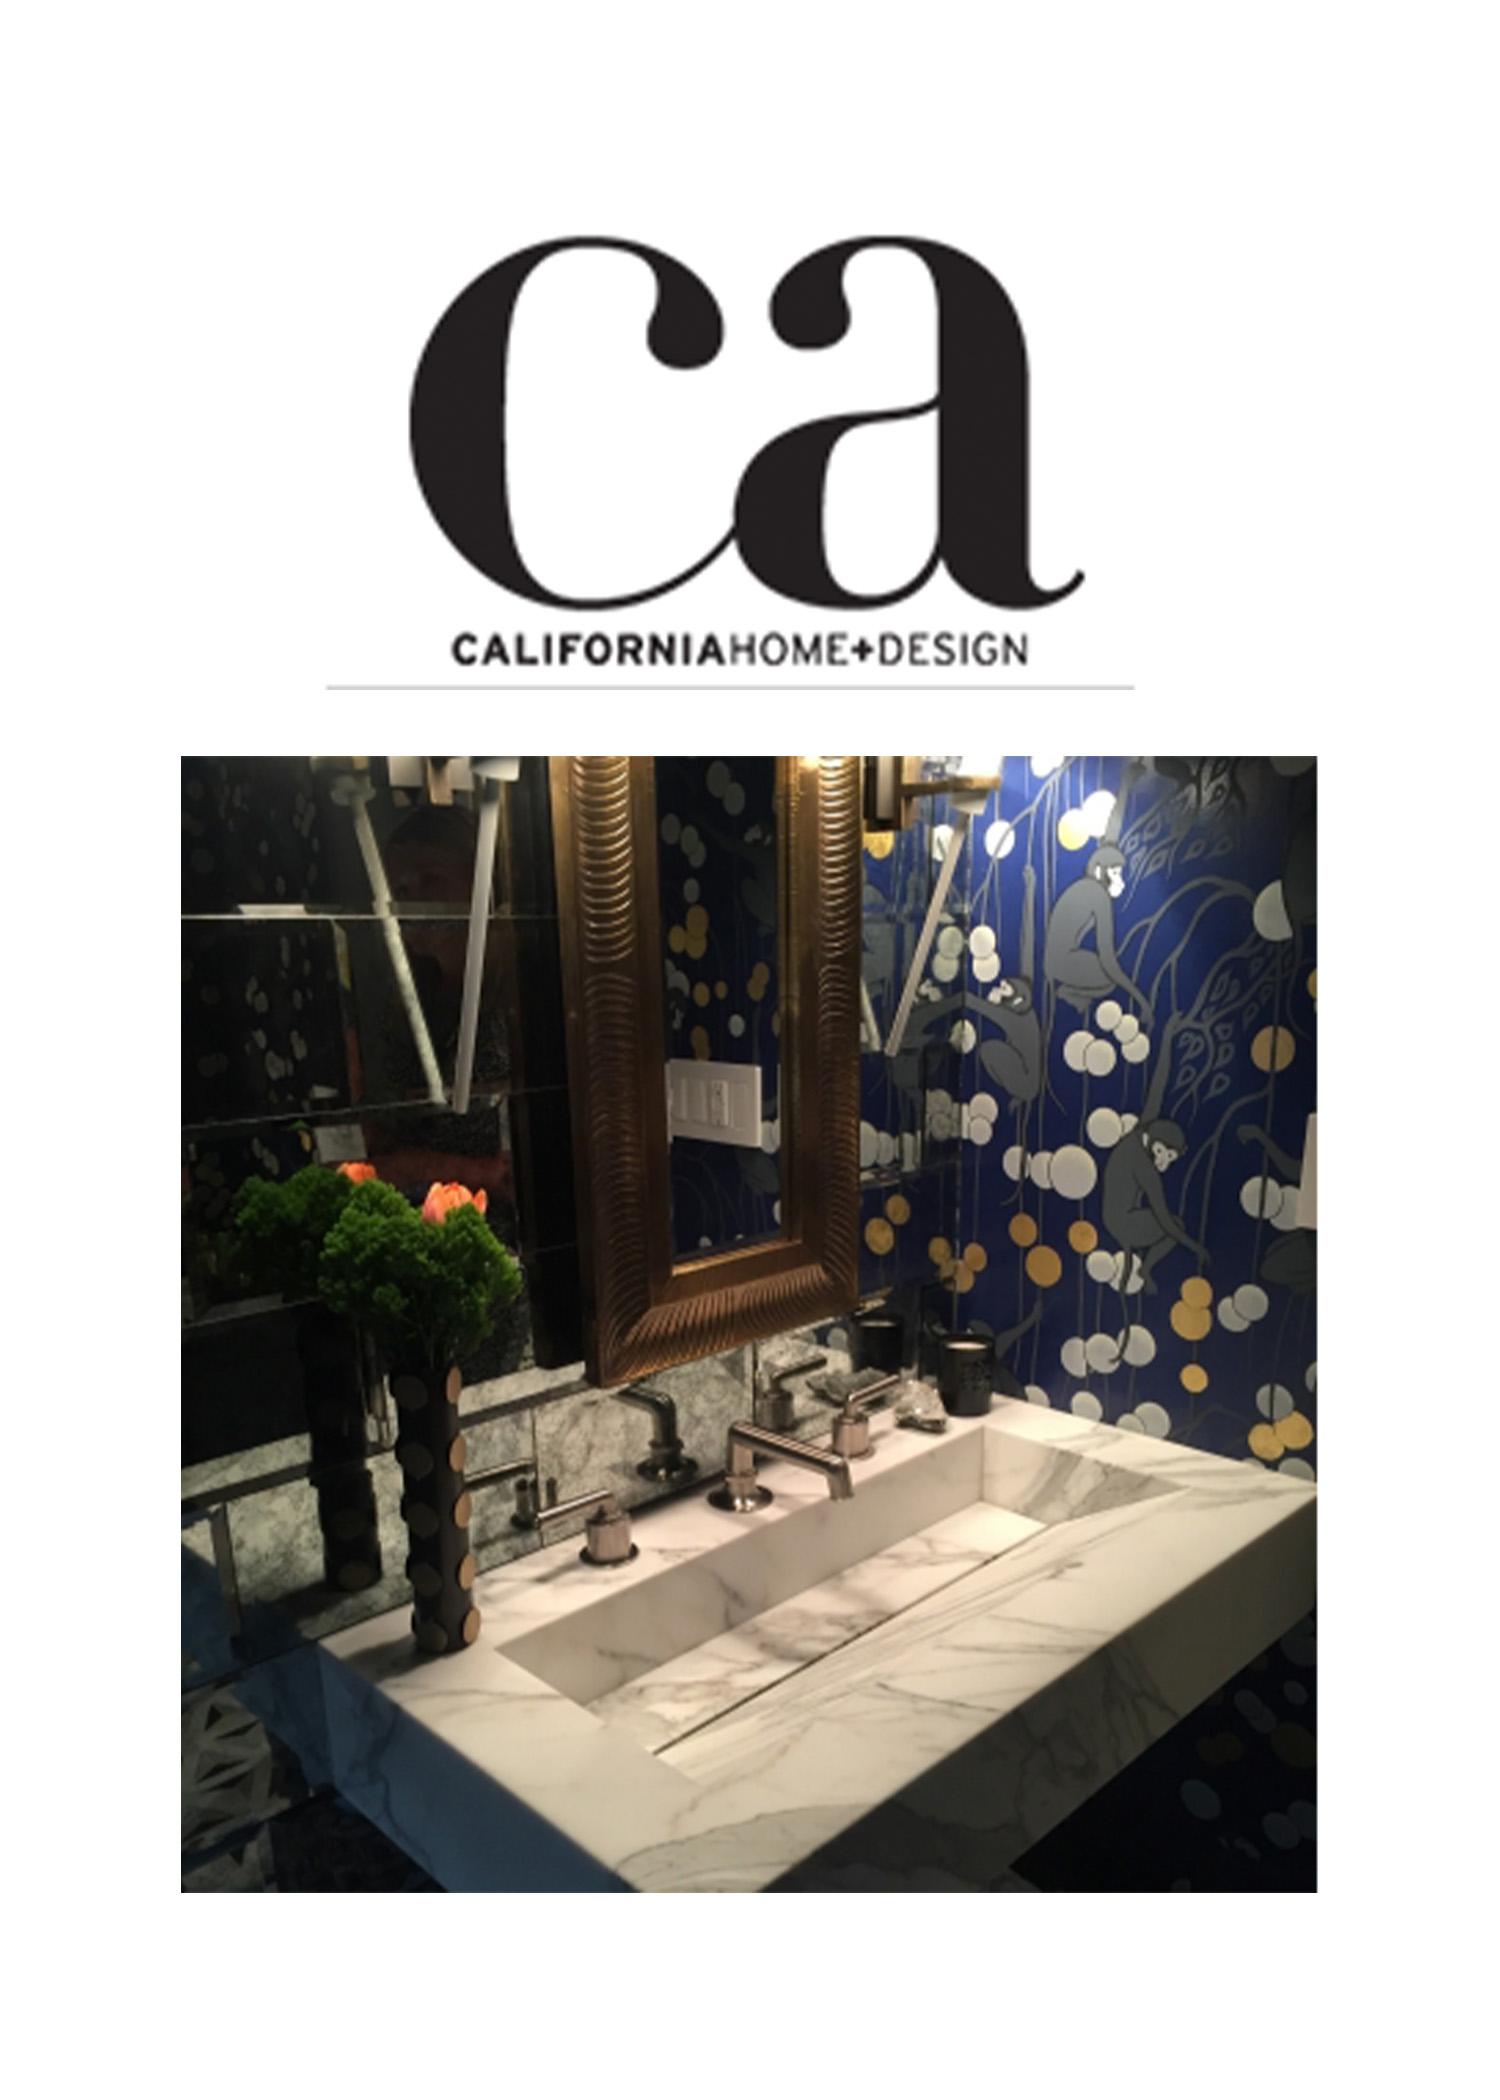 CALIFORNIA HOME+DESIGN